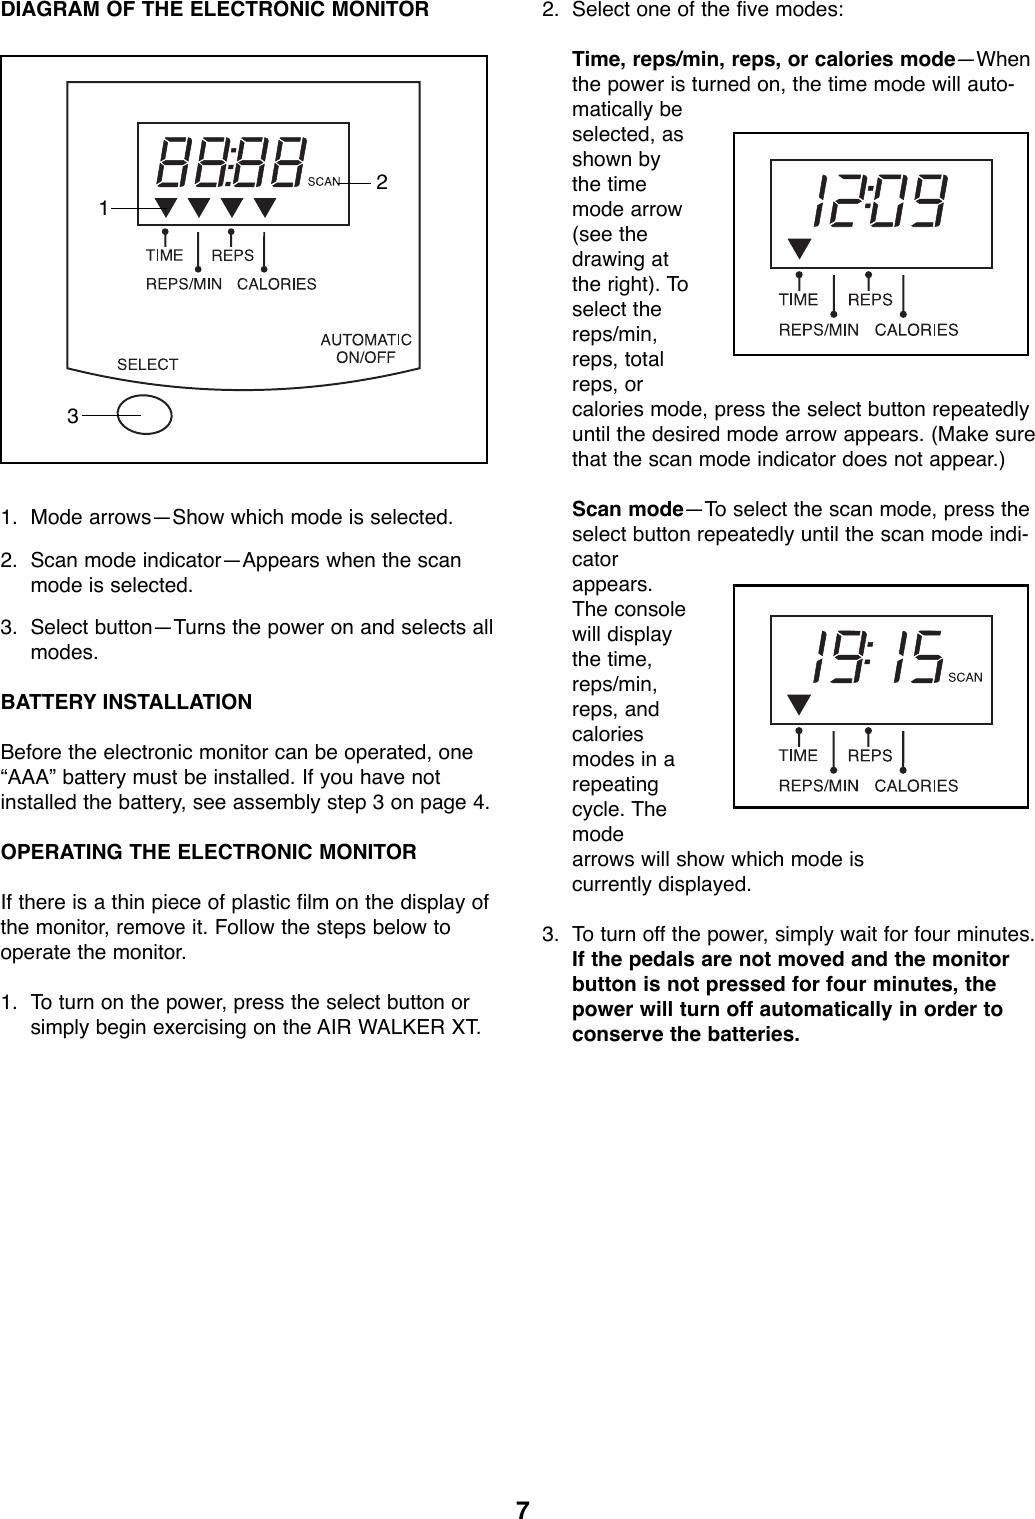 Proform Pfaw76070 Airwalker Xt Users Manual *PFAW76070 138946